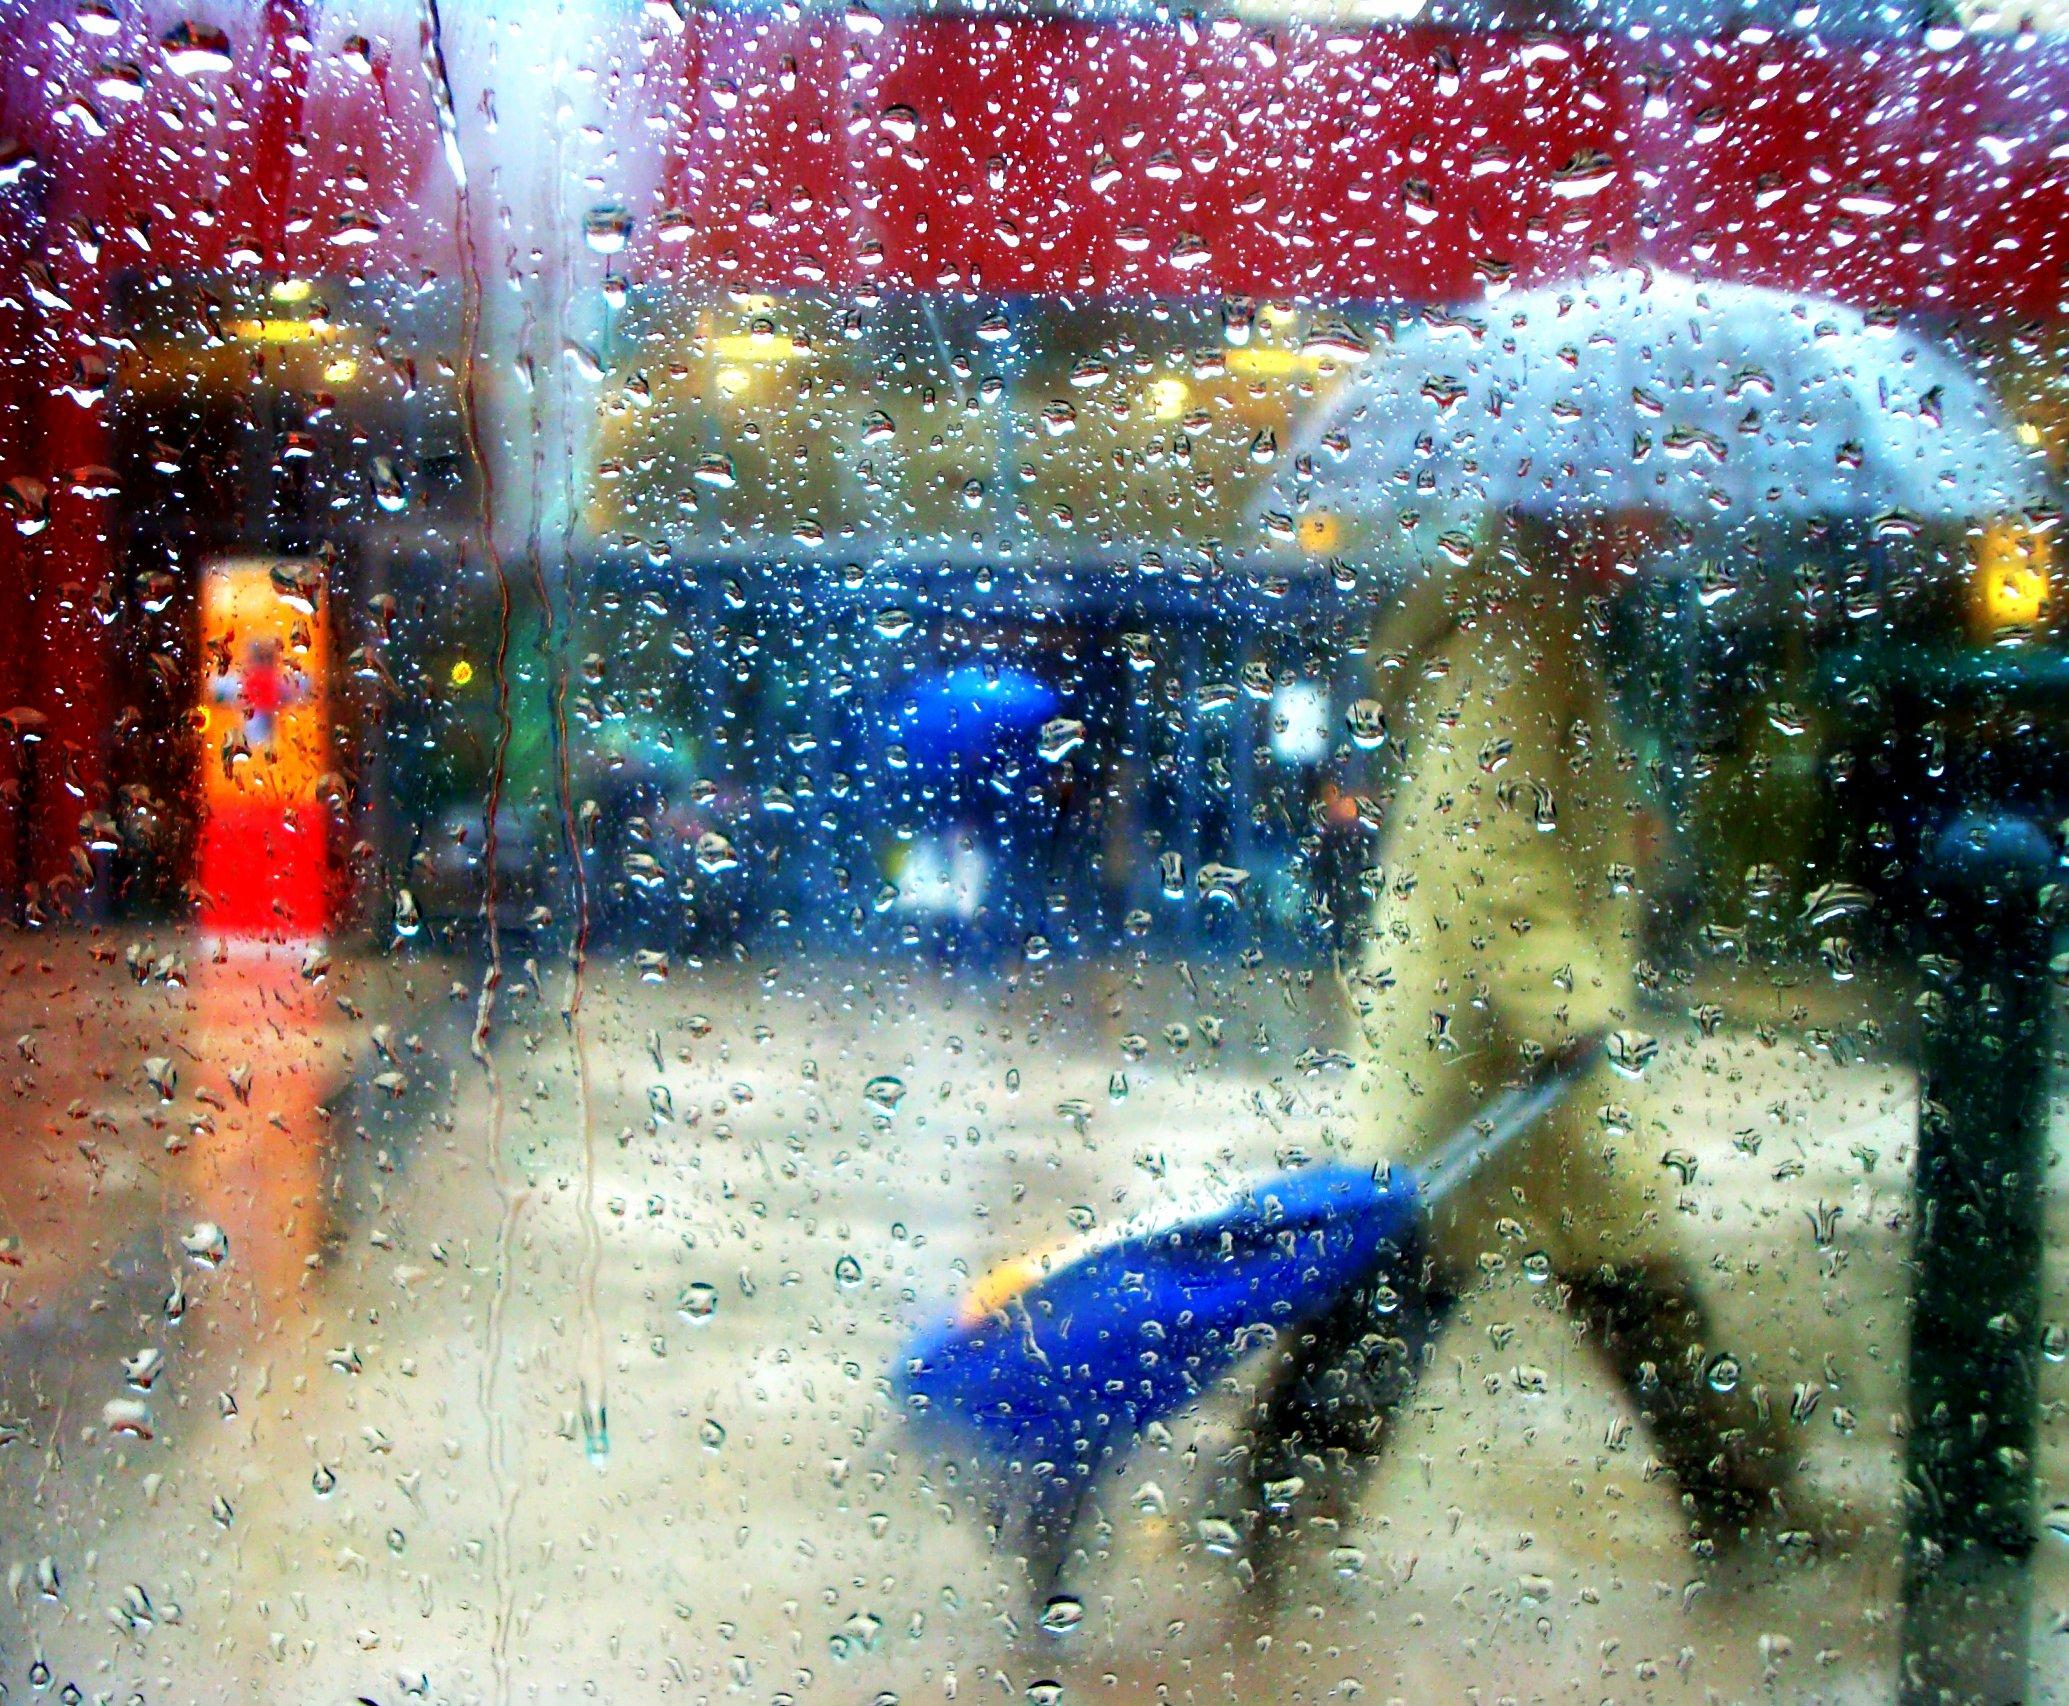 Masaustu Boyama Su Yagmur Resim Kamera Mavi Sony Sanat